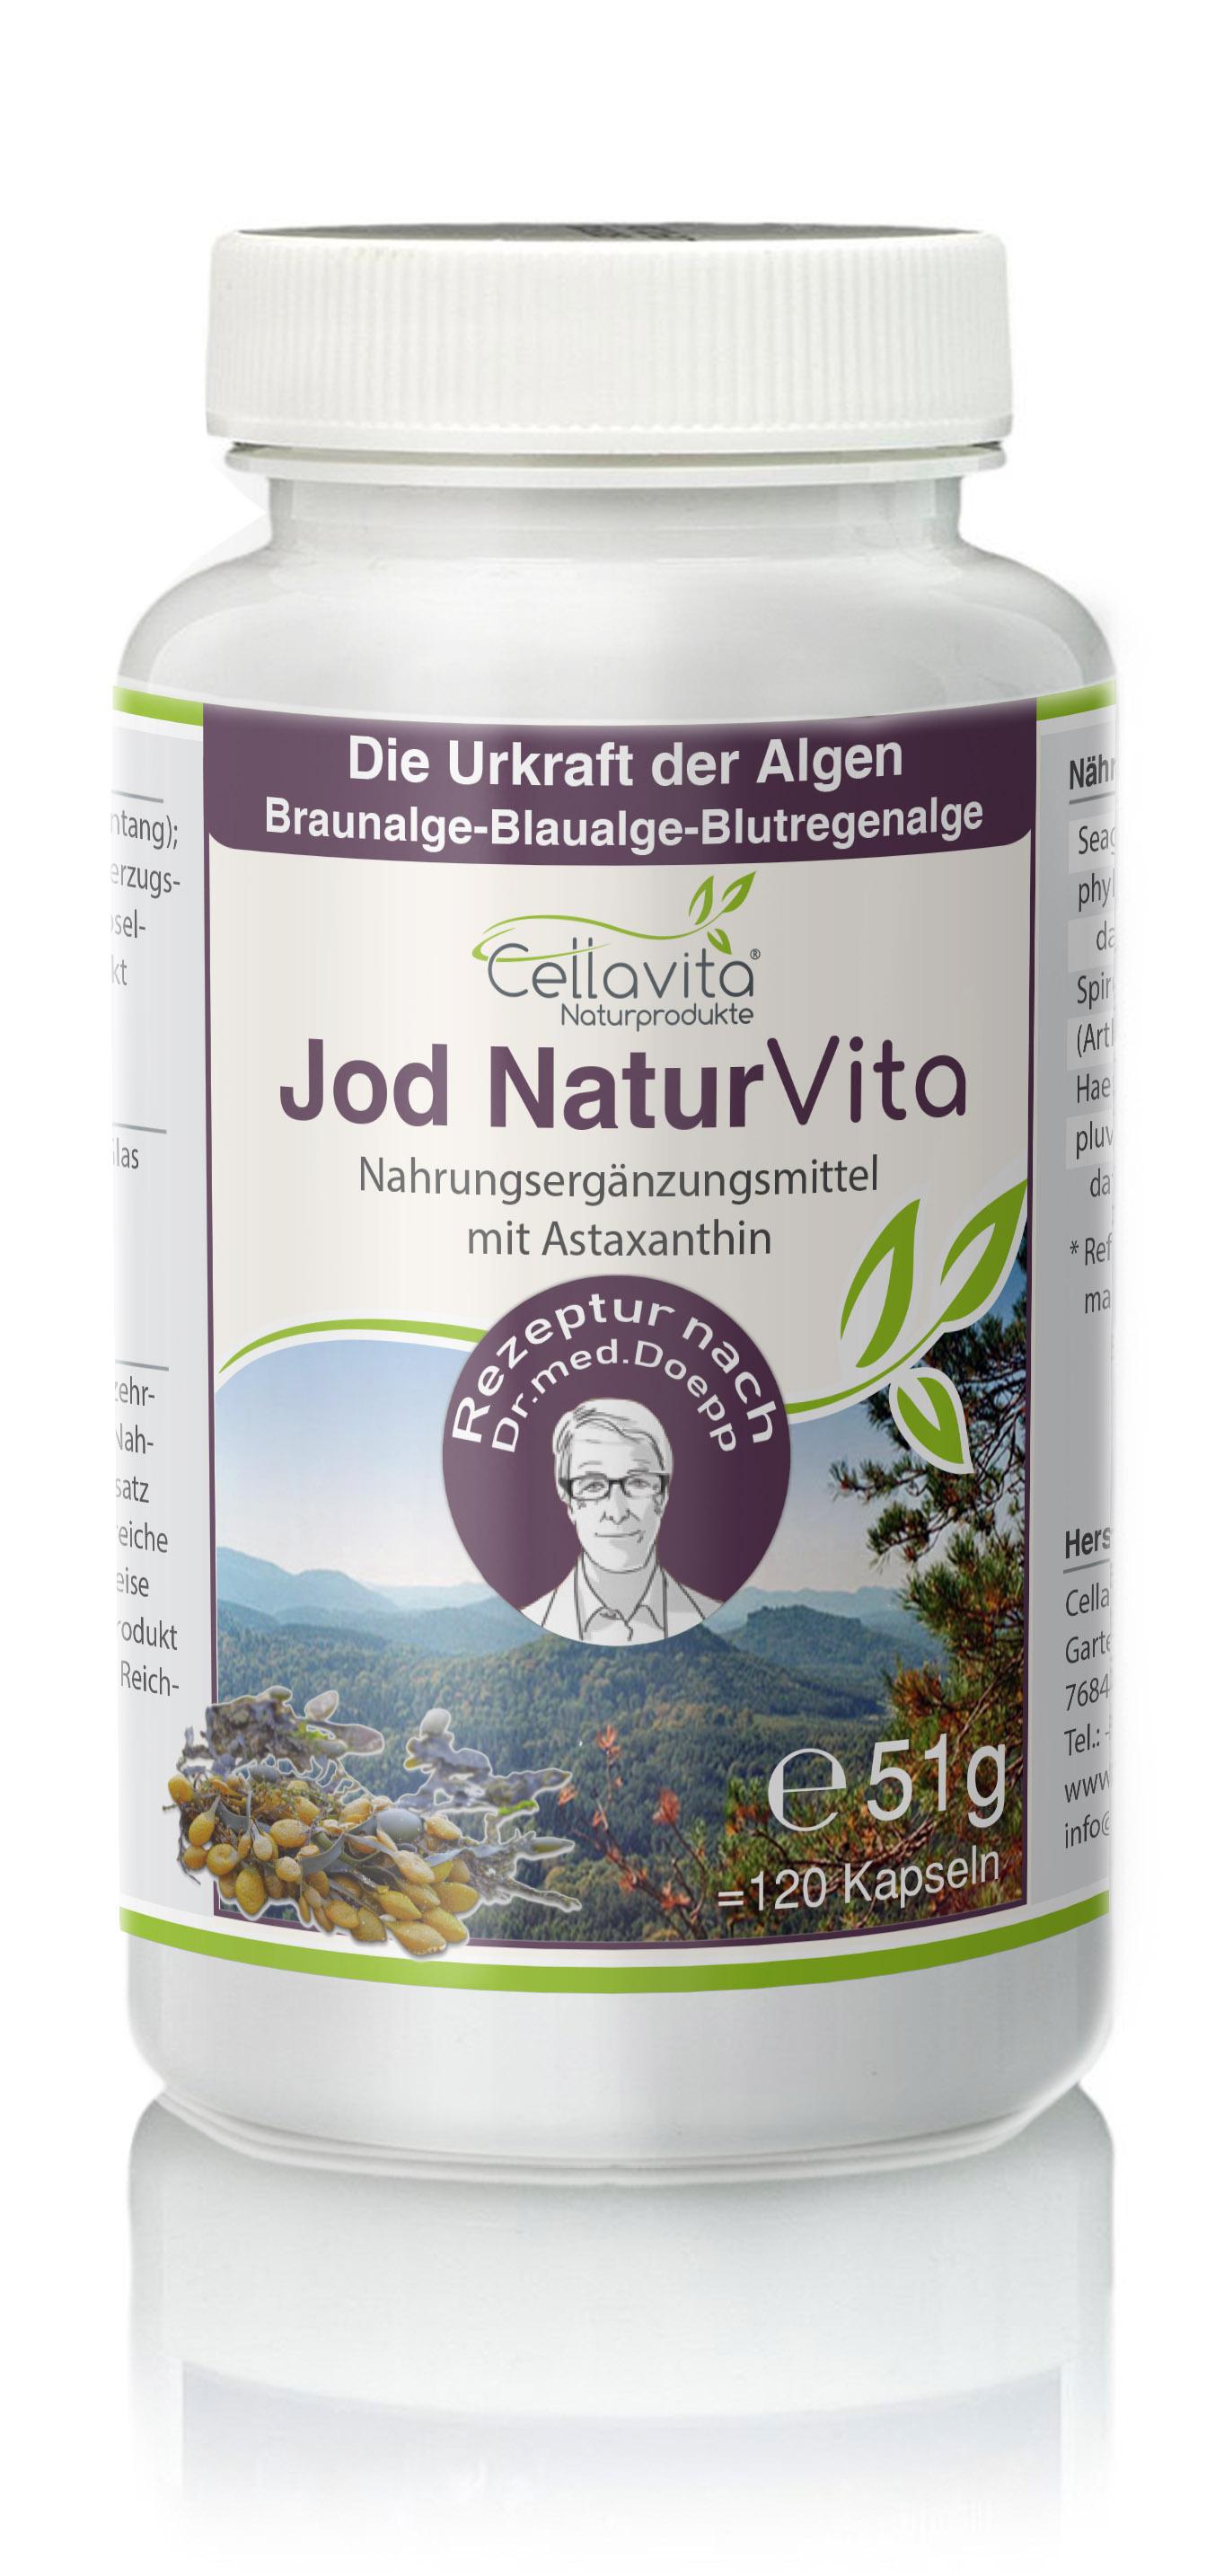 Jod Natur Vita 4 Monatsvorrat 120 Kapseln Rezeptur Nach Dr Med M Doepp